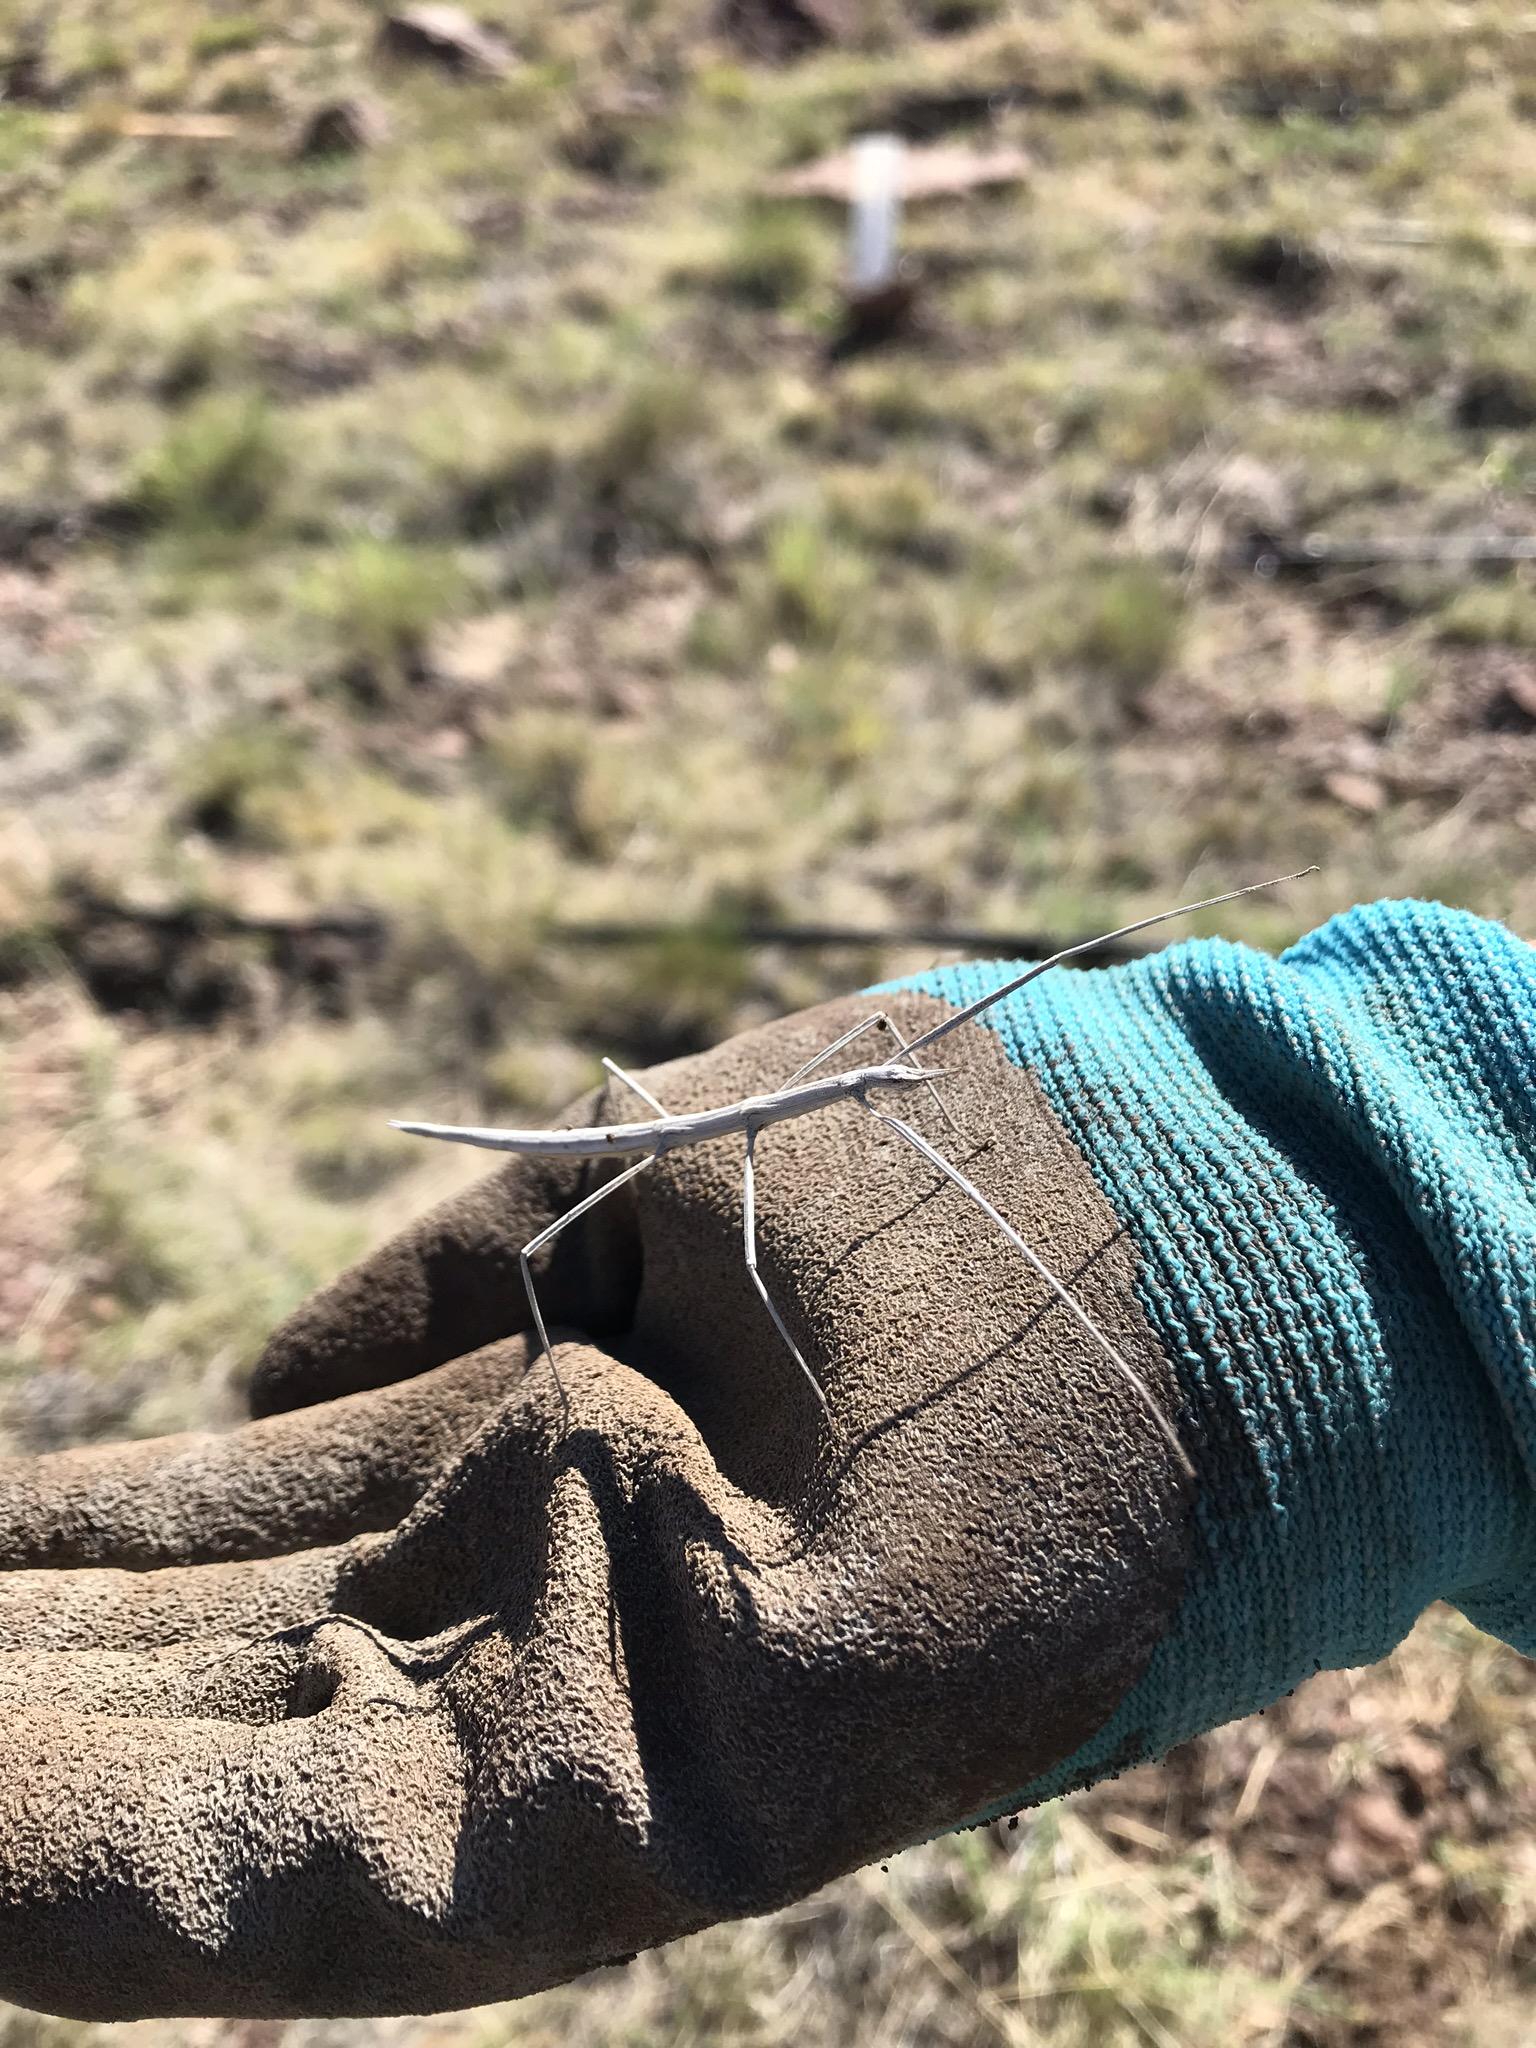 A cool stick bug!